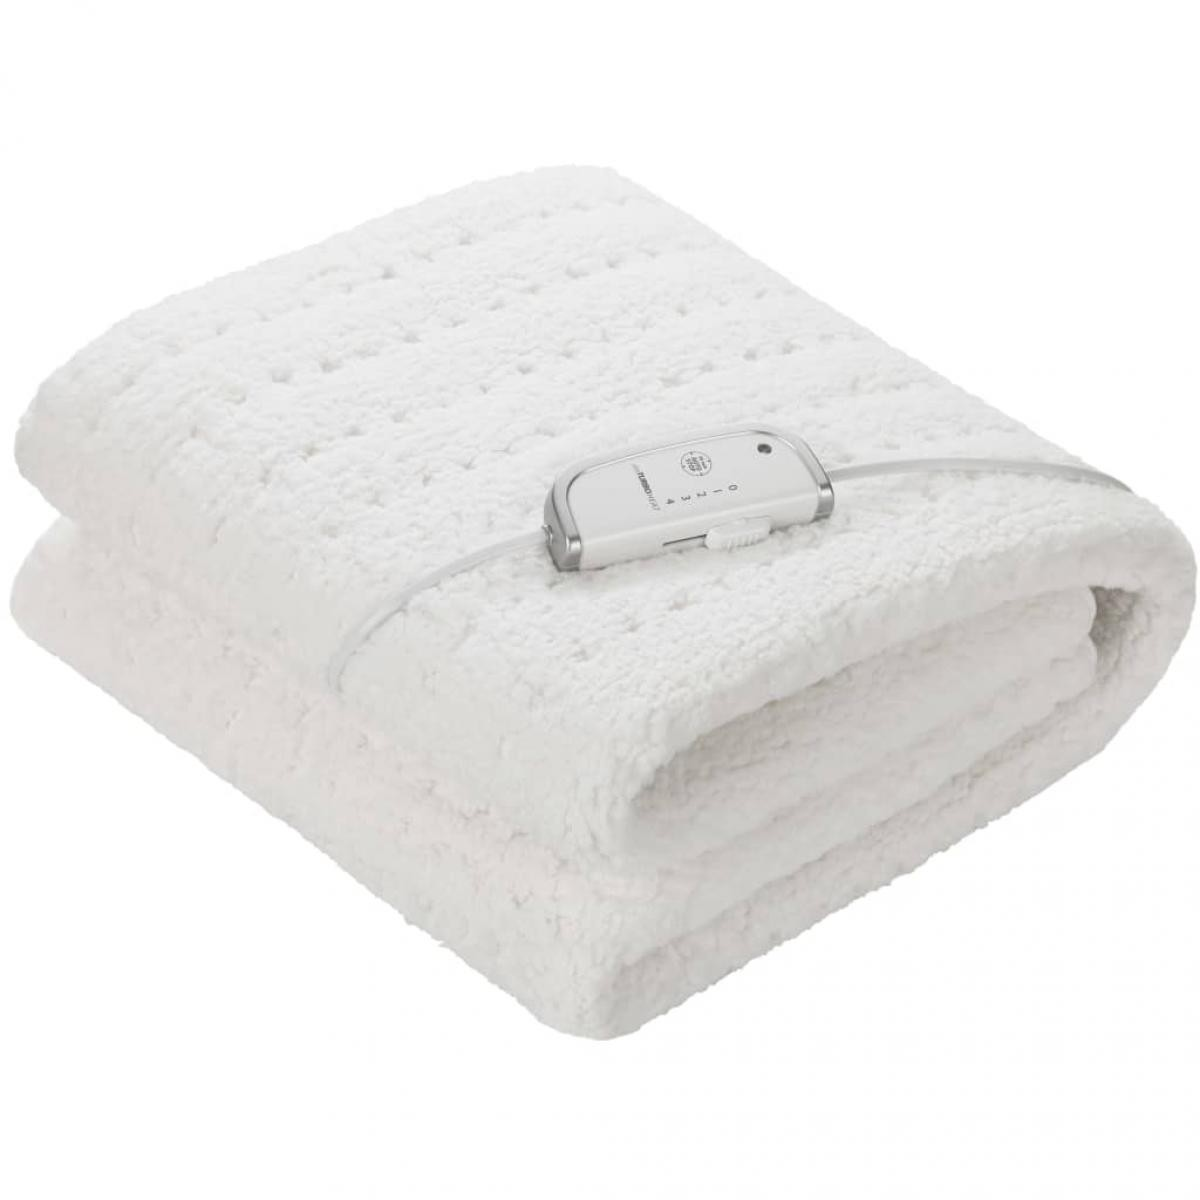 Medisana Medisana Couverture chauffante Molleton (Maxi) HU 672 0,8x1,5 m Blanc